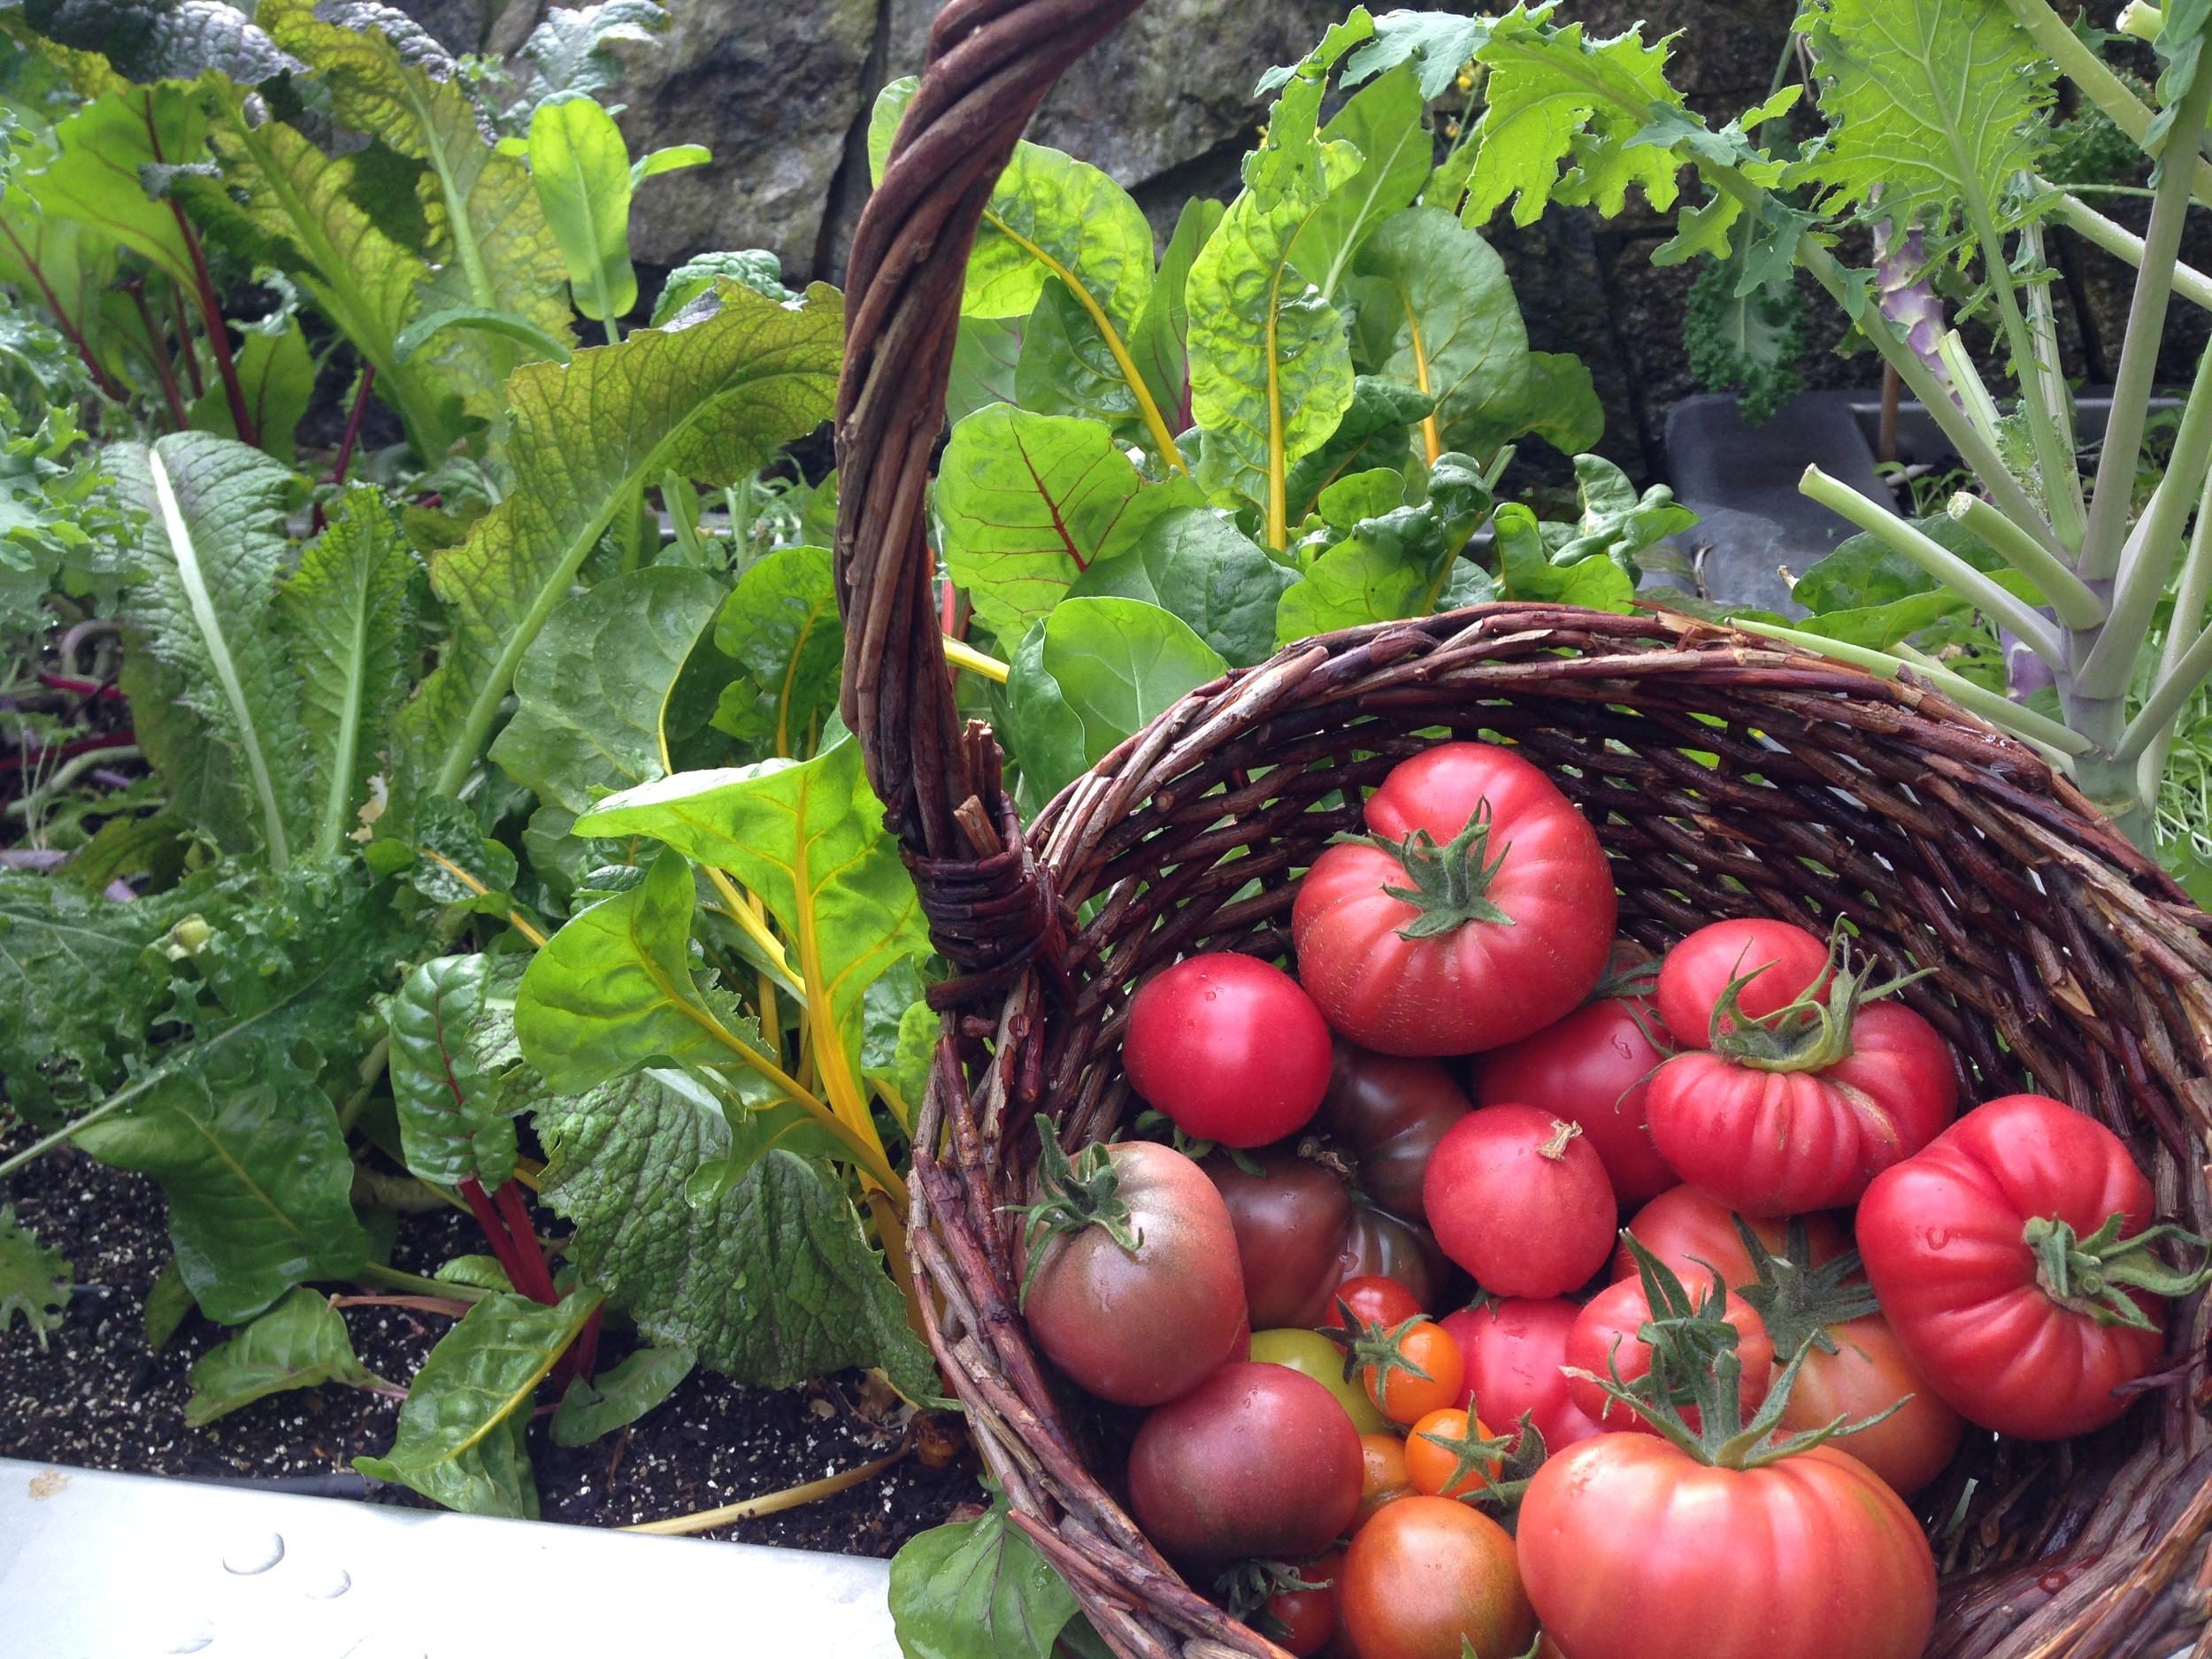 tomatobasket1.jpg